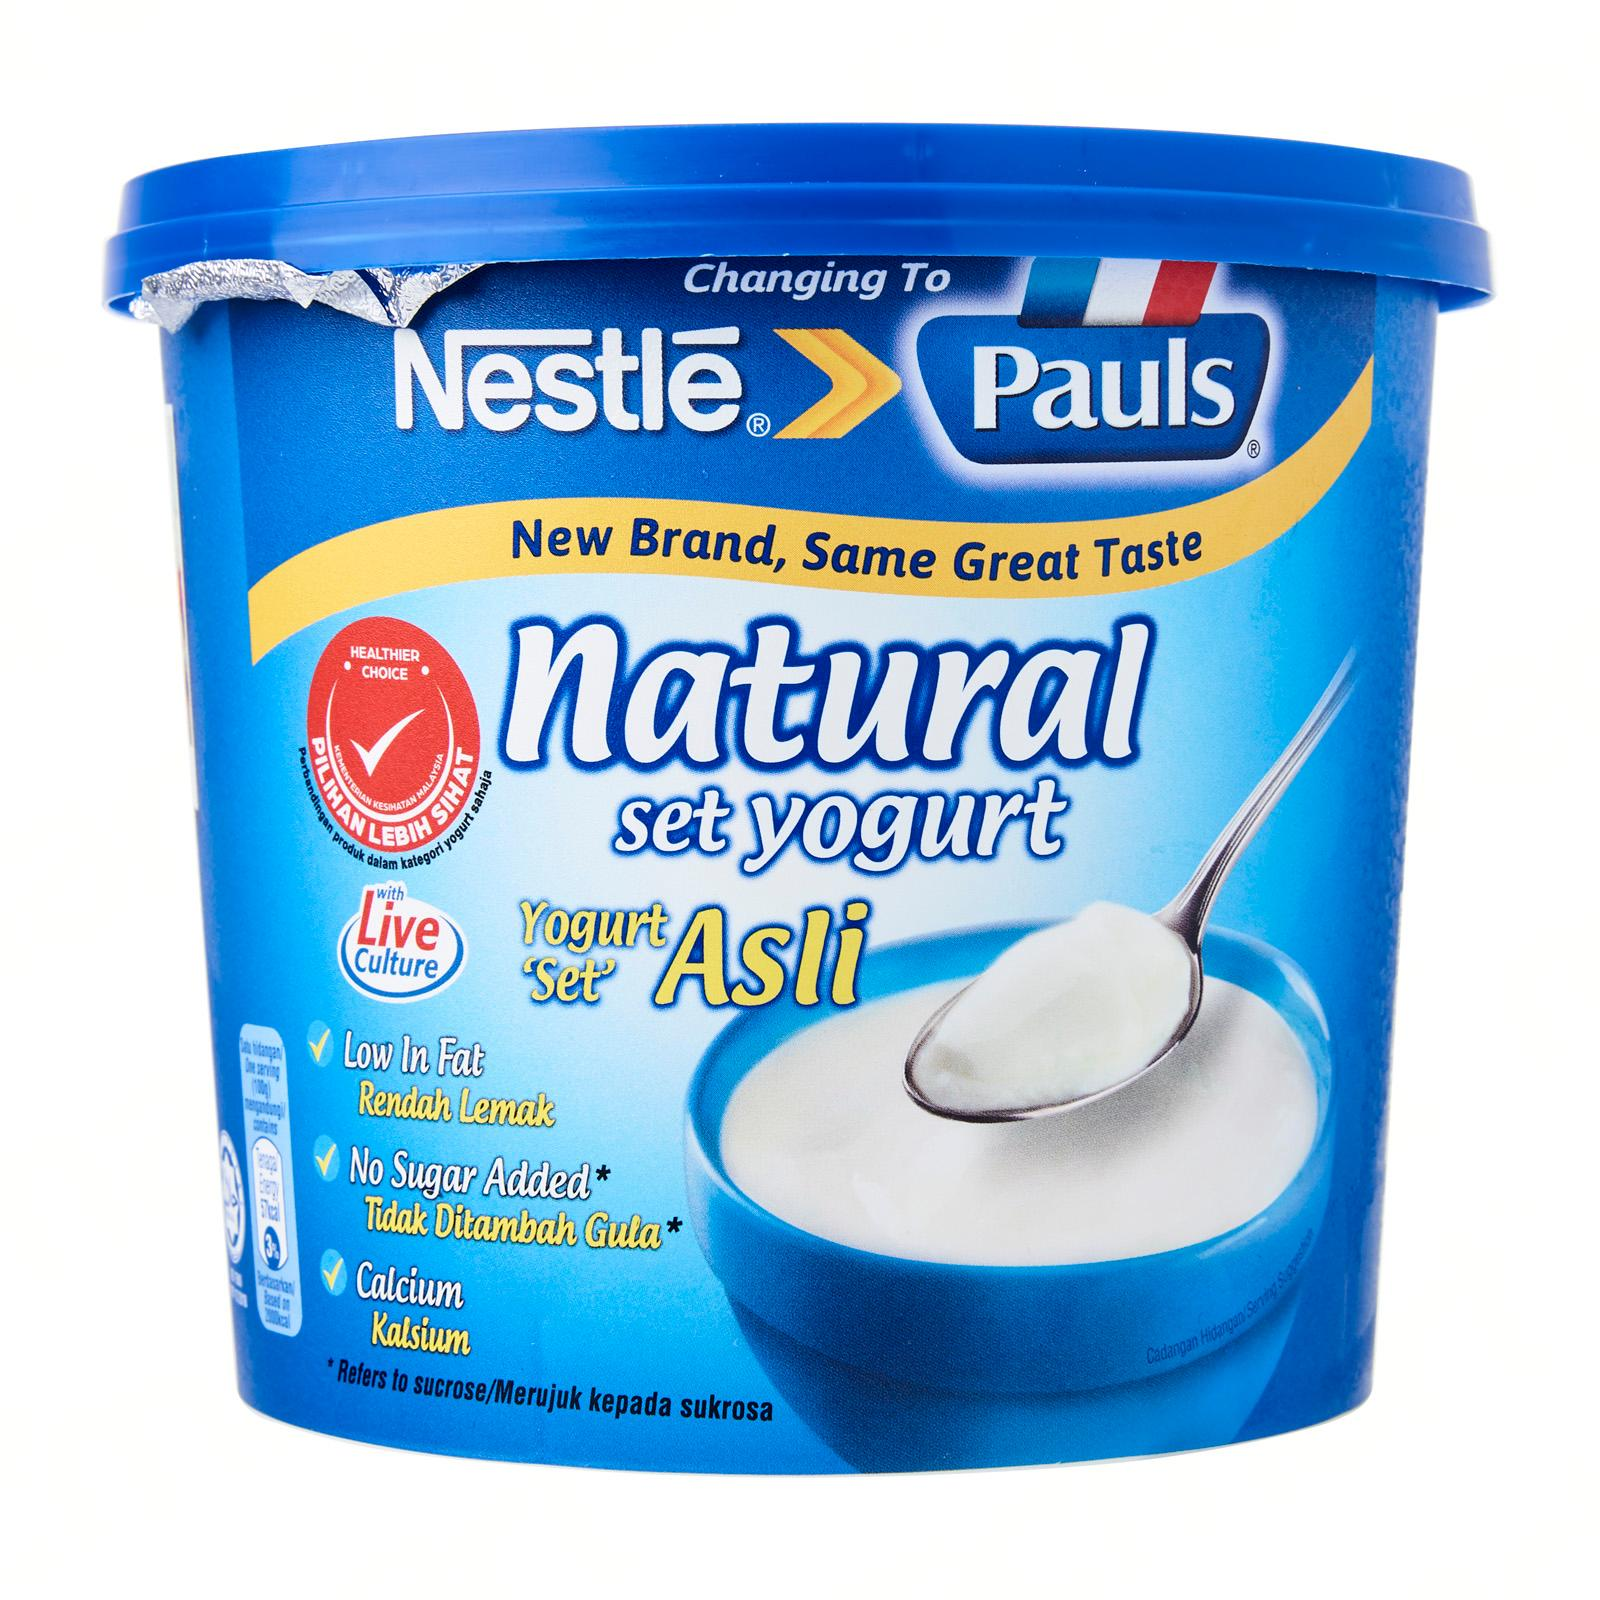 NESTLE Pauls Natural Set Yogurt